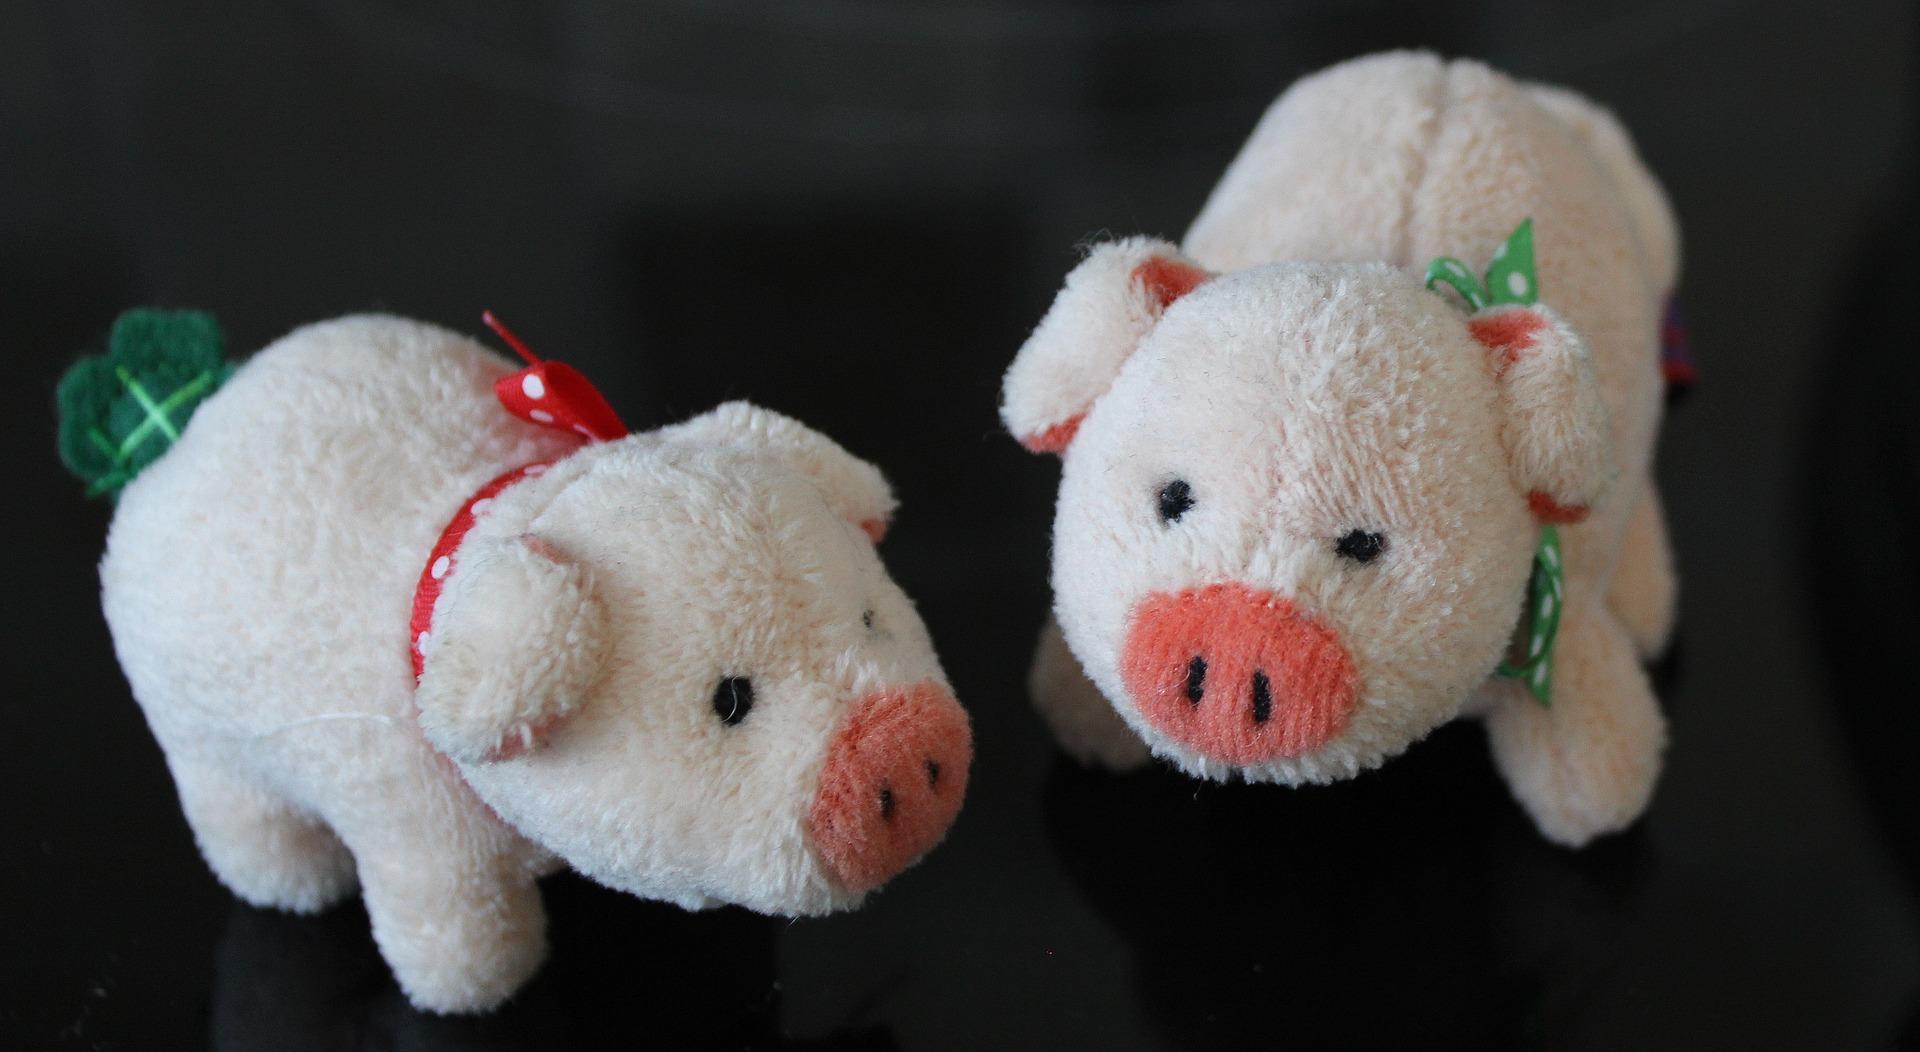 Little Pigs, Fig, Figure, Little, Object, HQ Photo